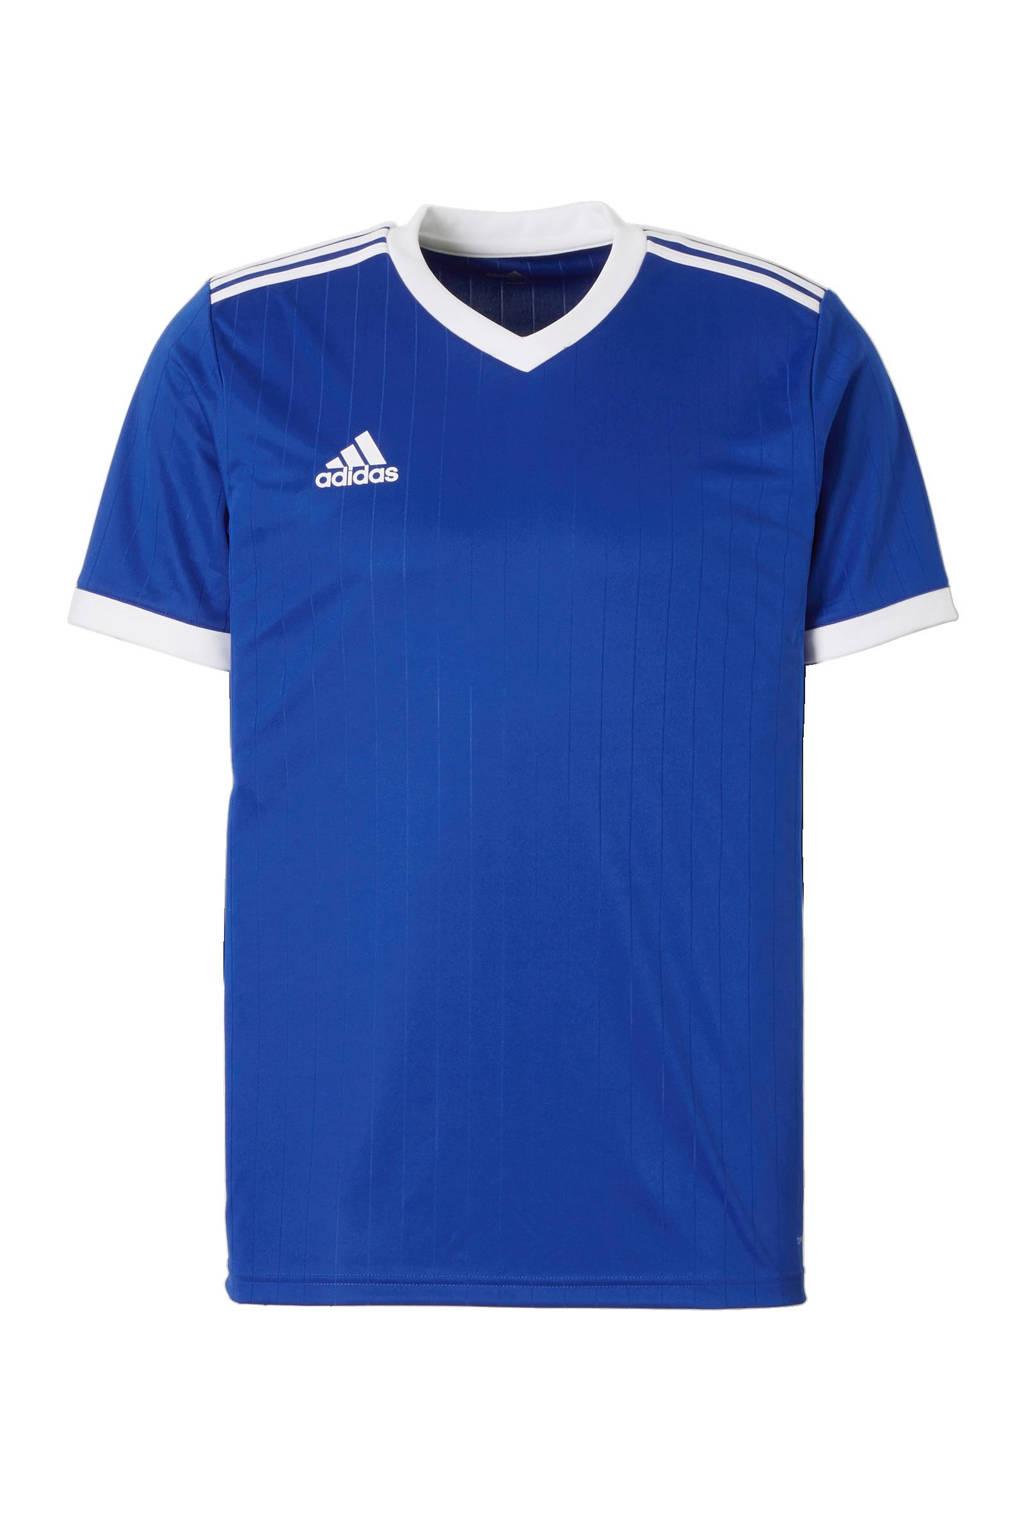 adidas Senior  sport T-shirt Tabela blauw/wit, Blauw/wit, Heren